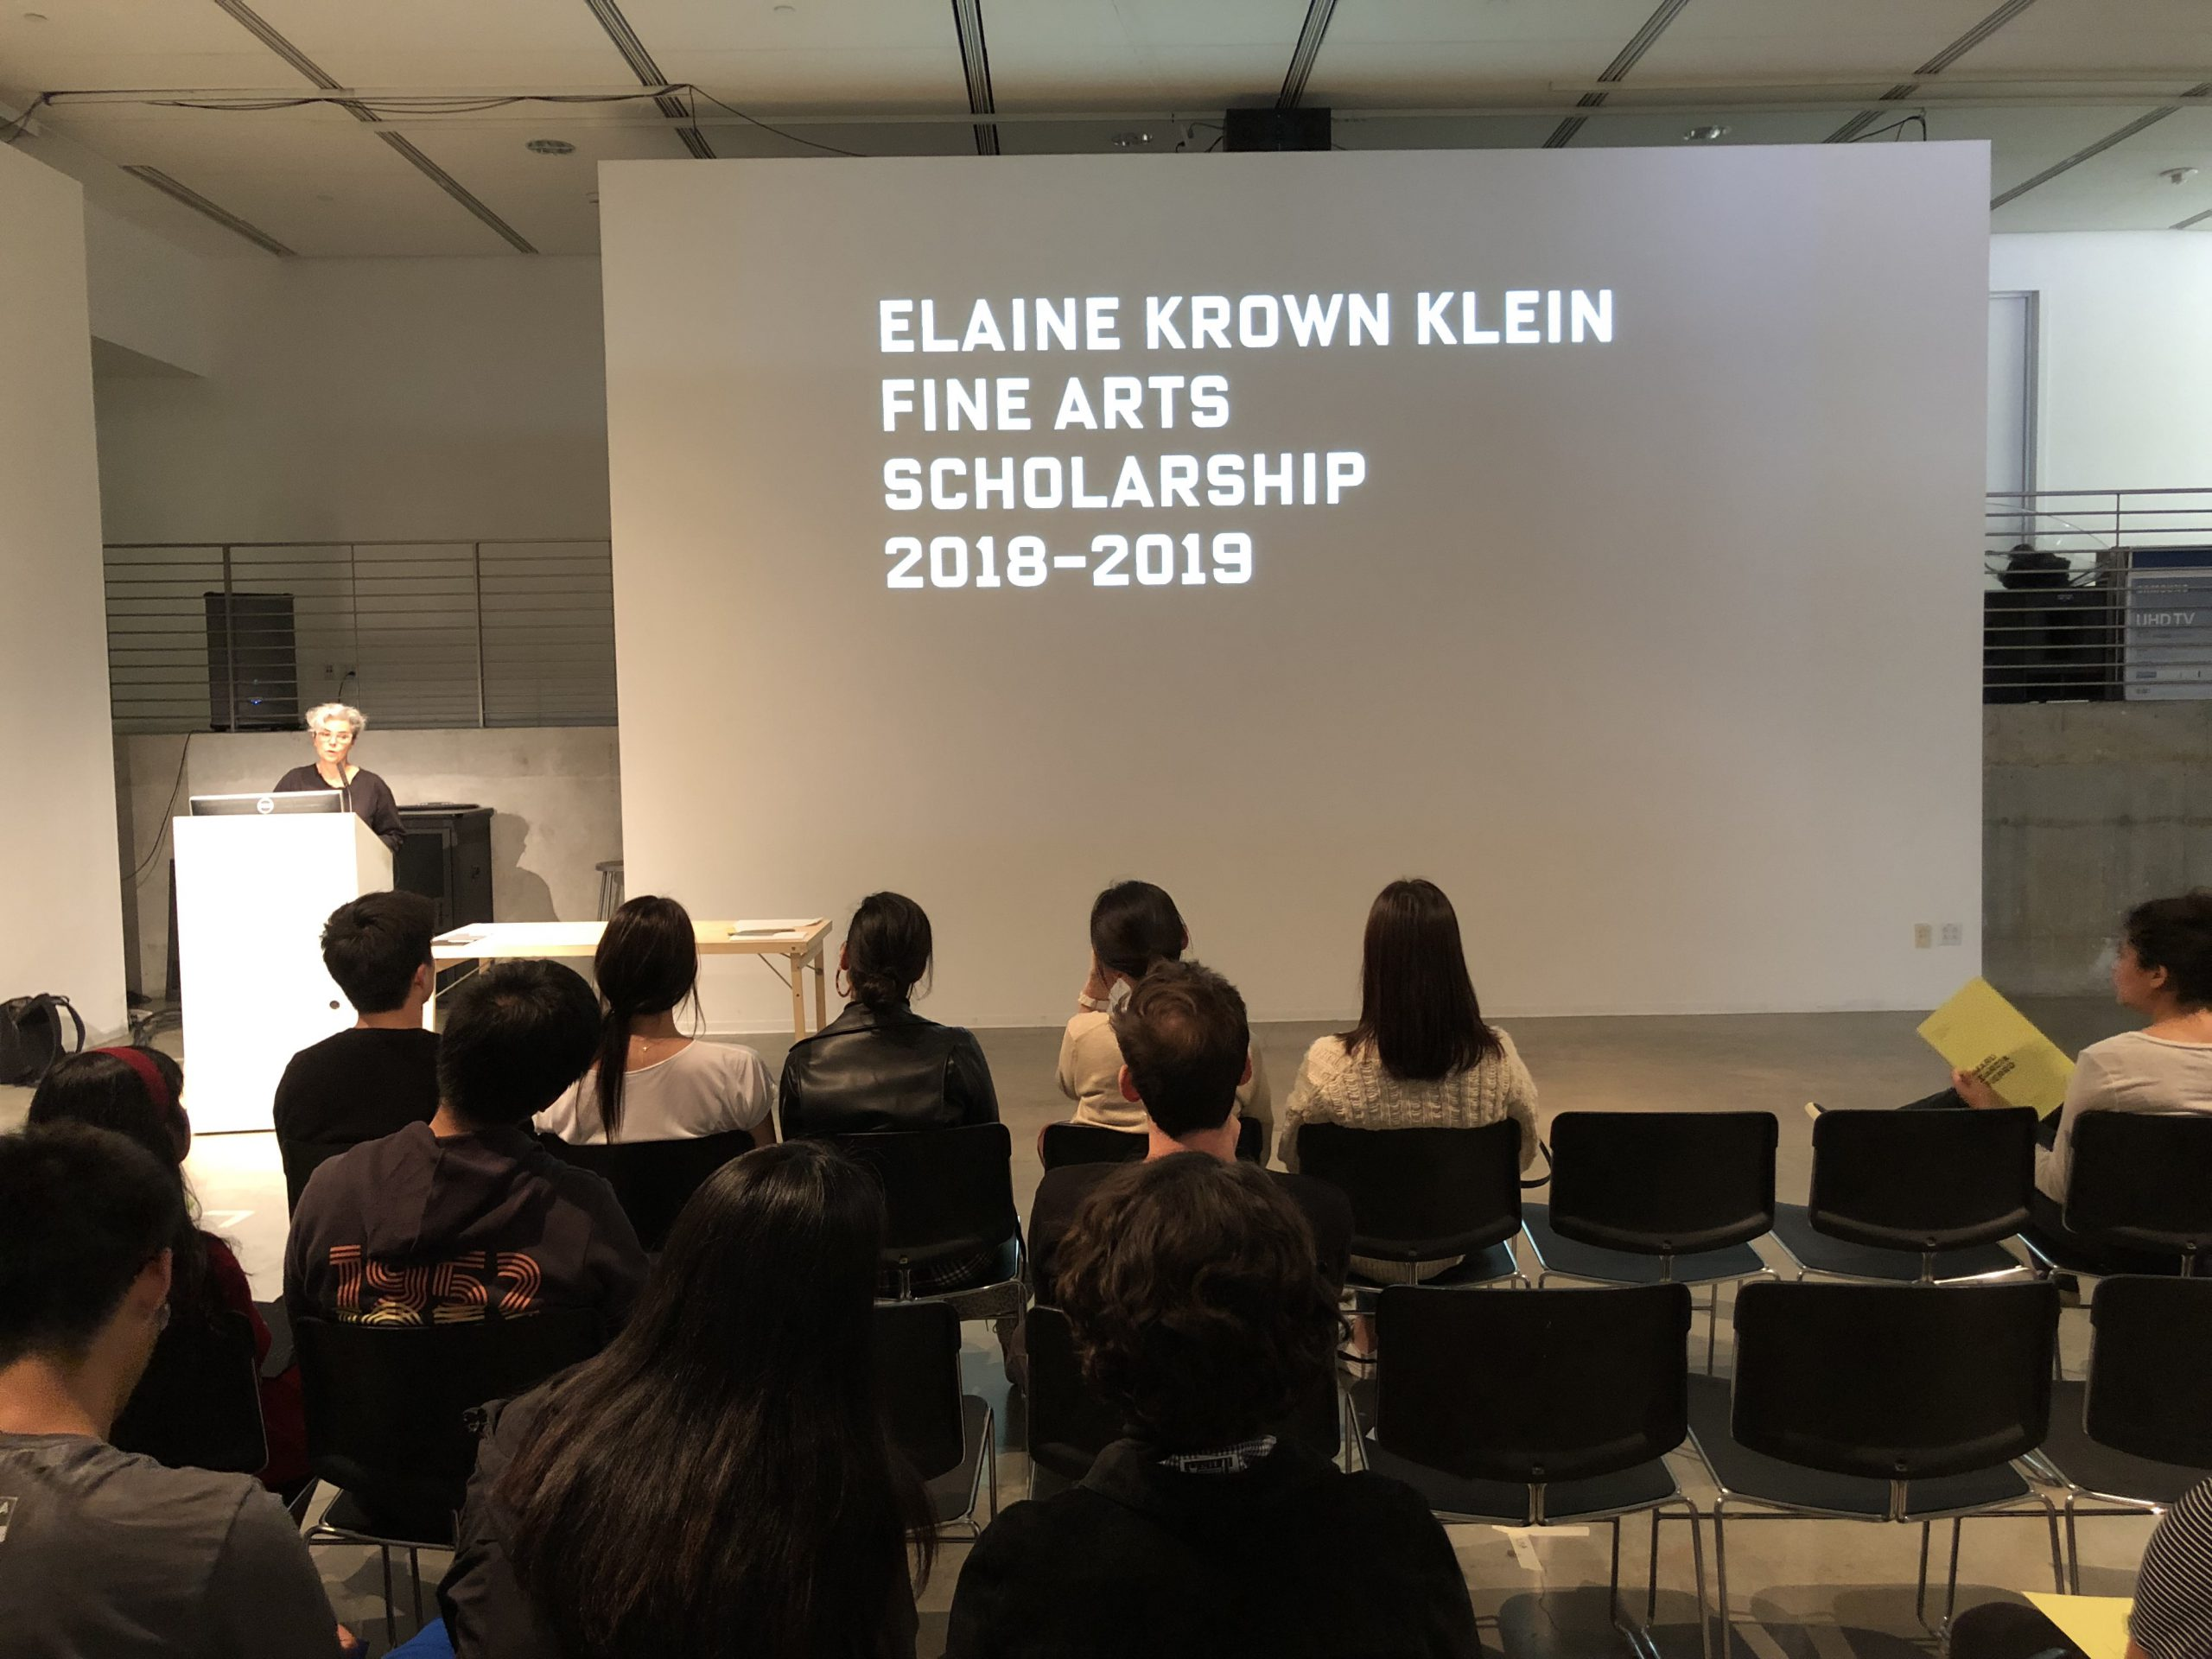 DMA Scholarship Reception 2019-2020, Elaine Crown Klein Fine Arts Scholarship 2018-2019